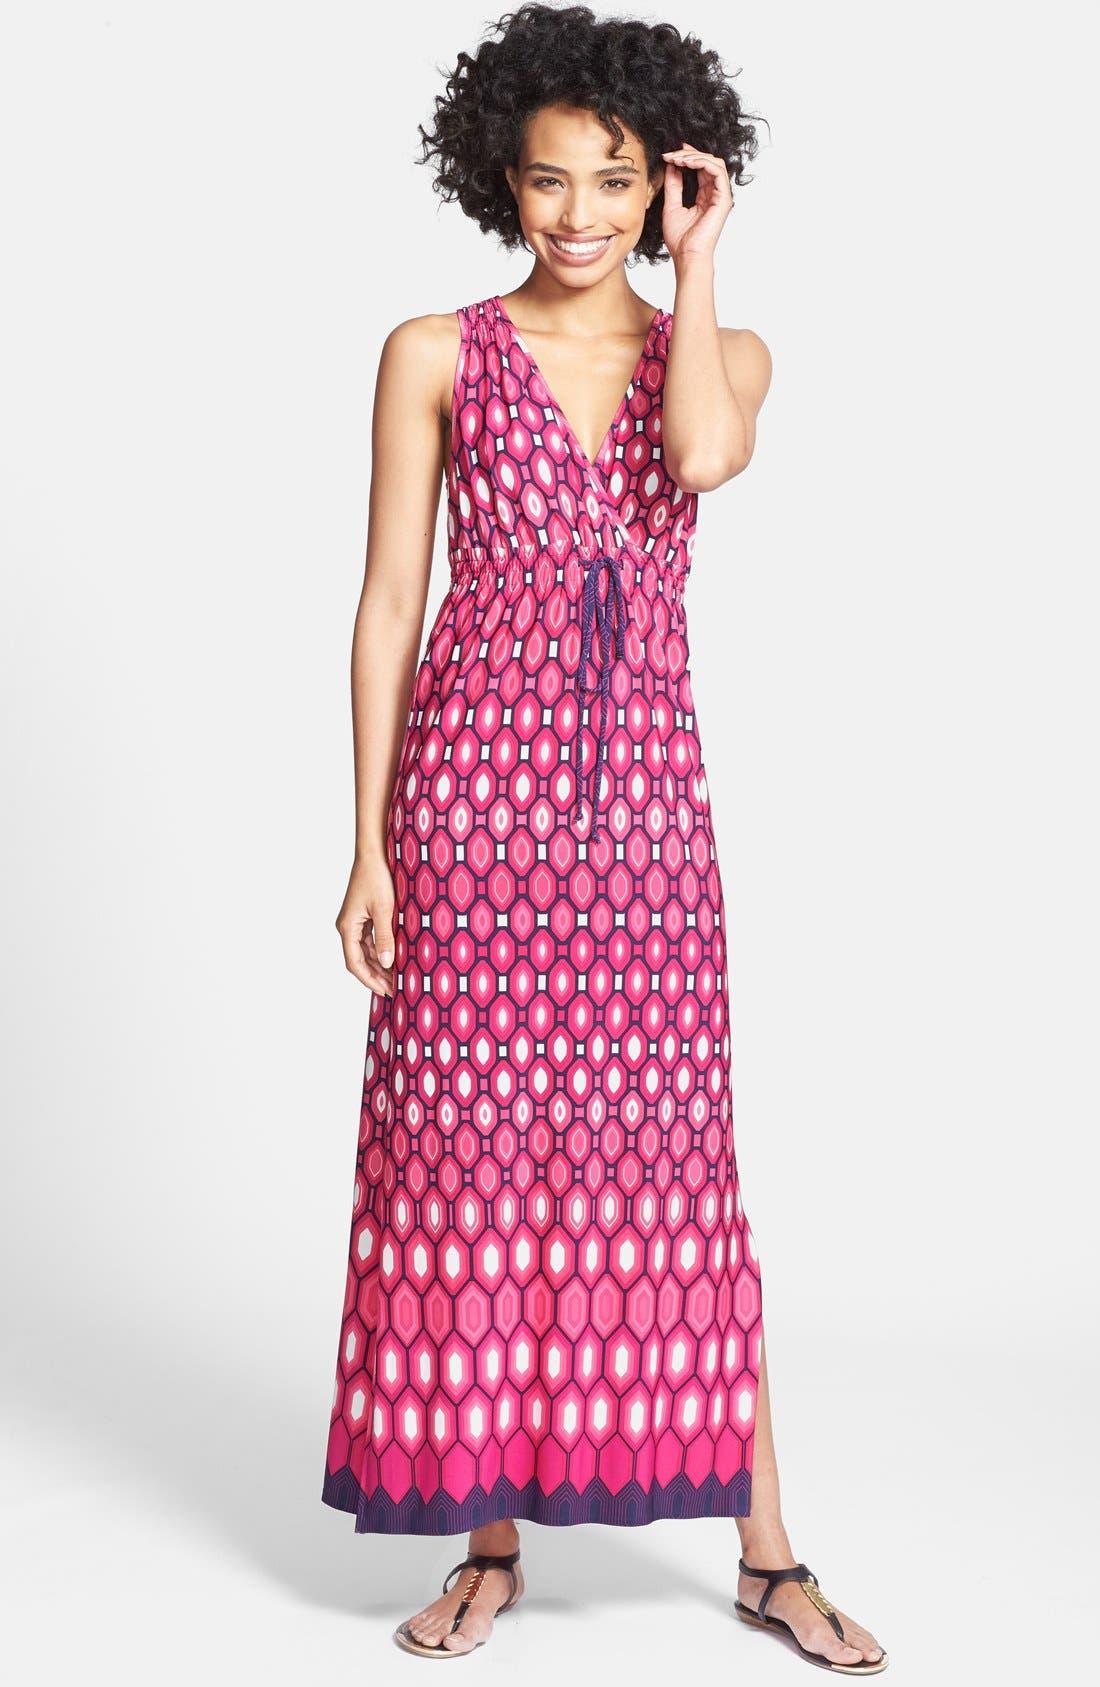 Main Image - Laundry by Shelli Segal Print Surplice V-Neck Maxi Dress